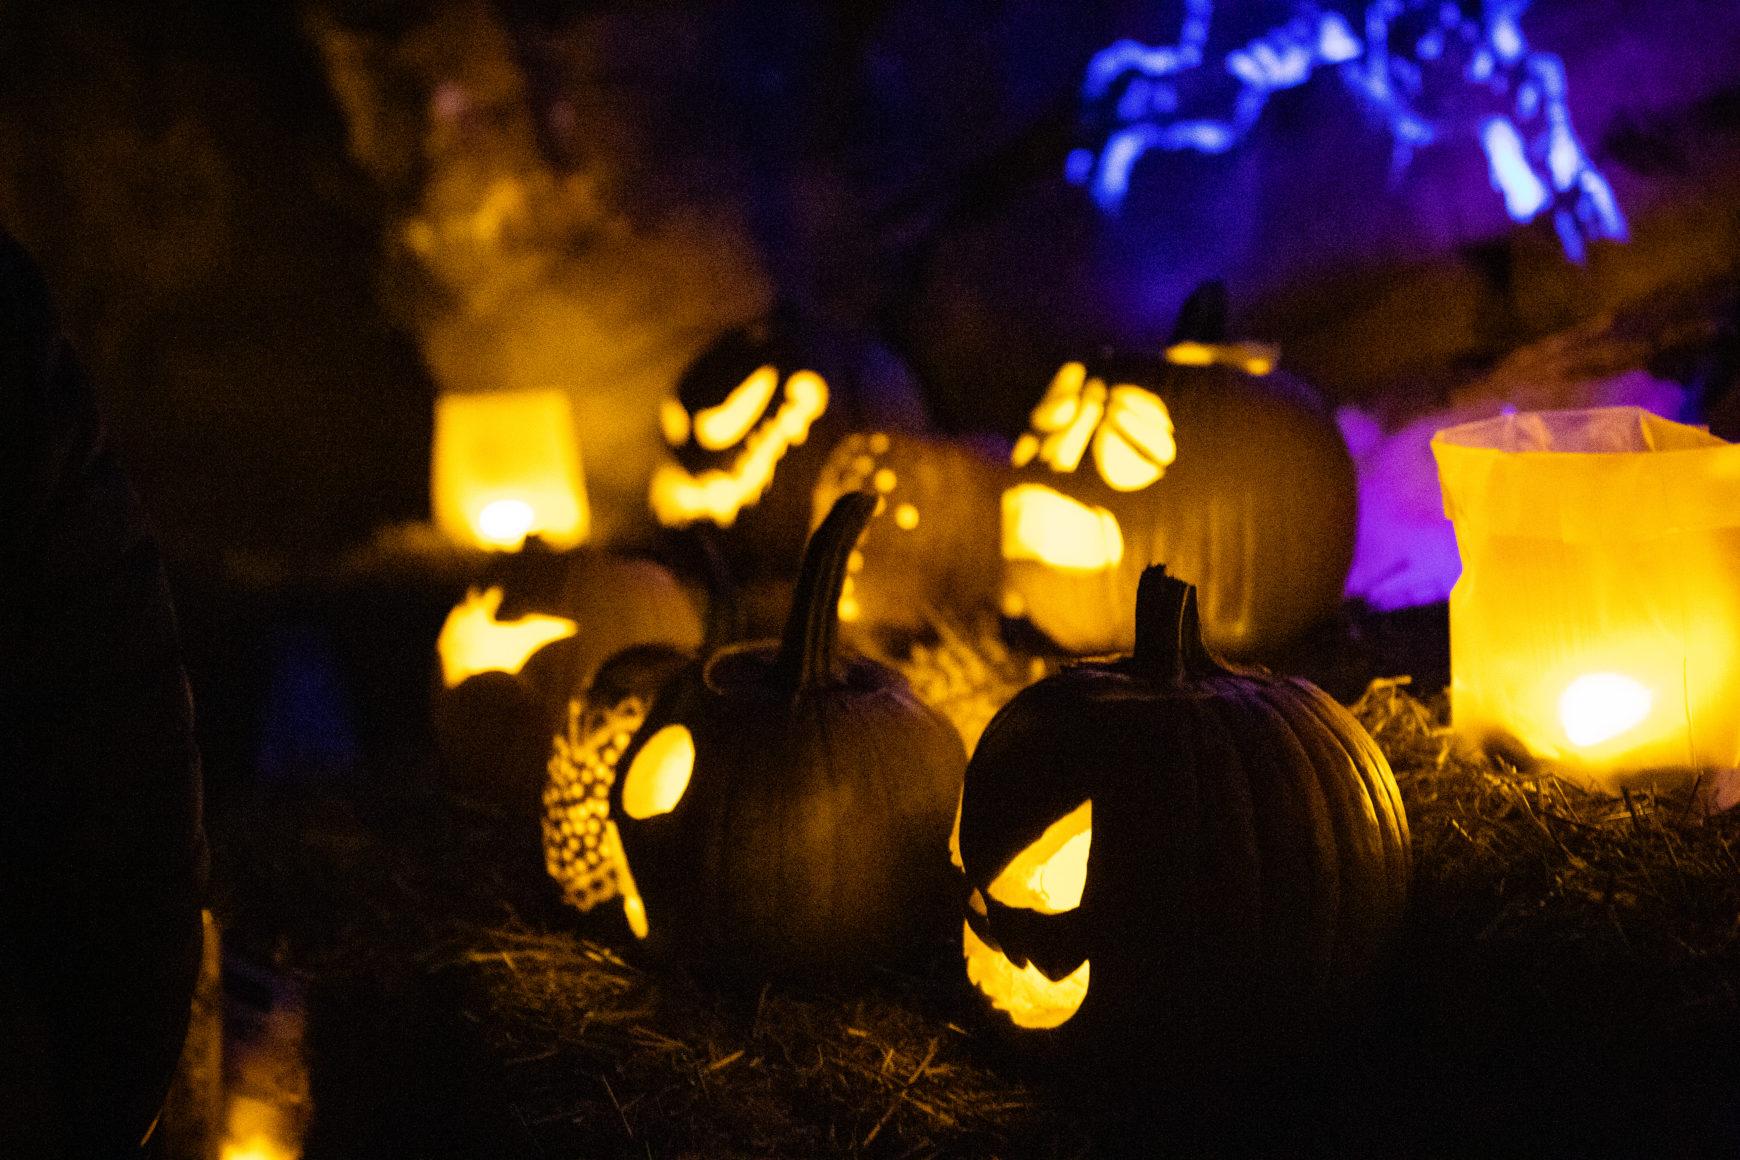 Penn State Arboretum To Host Annual Pumpkin Festival